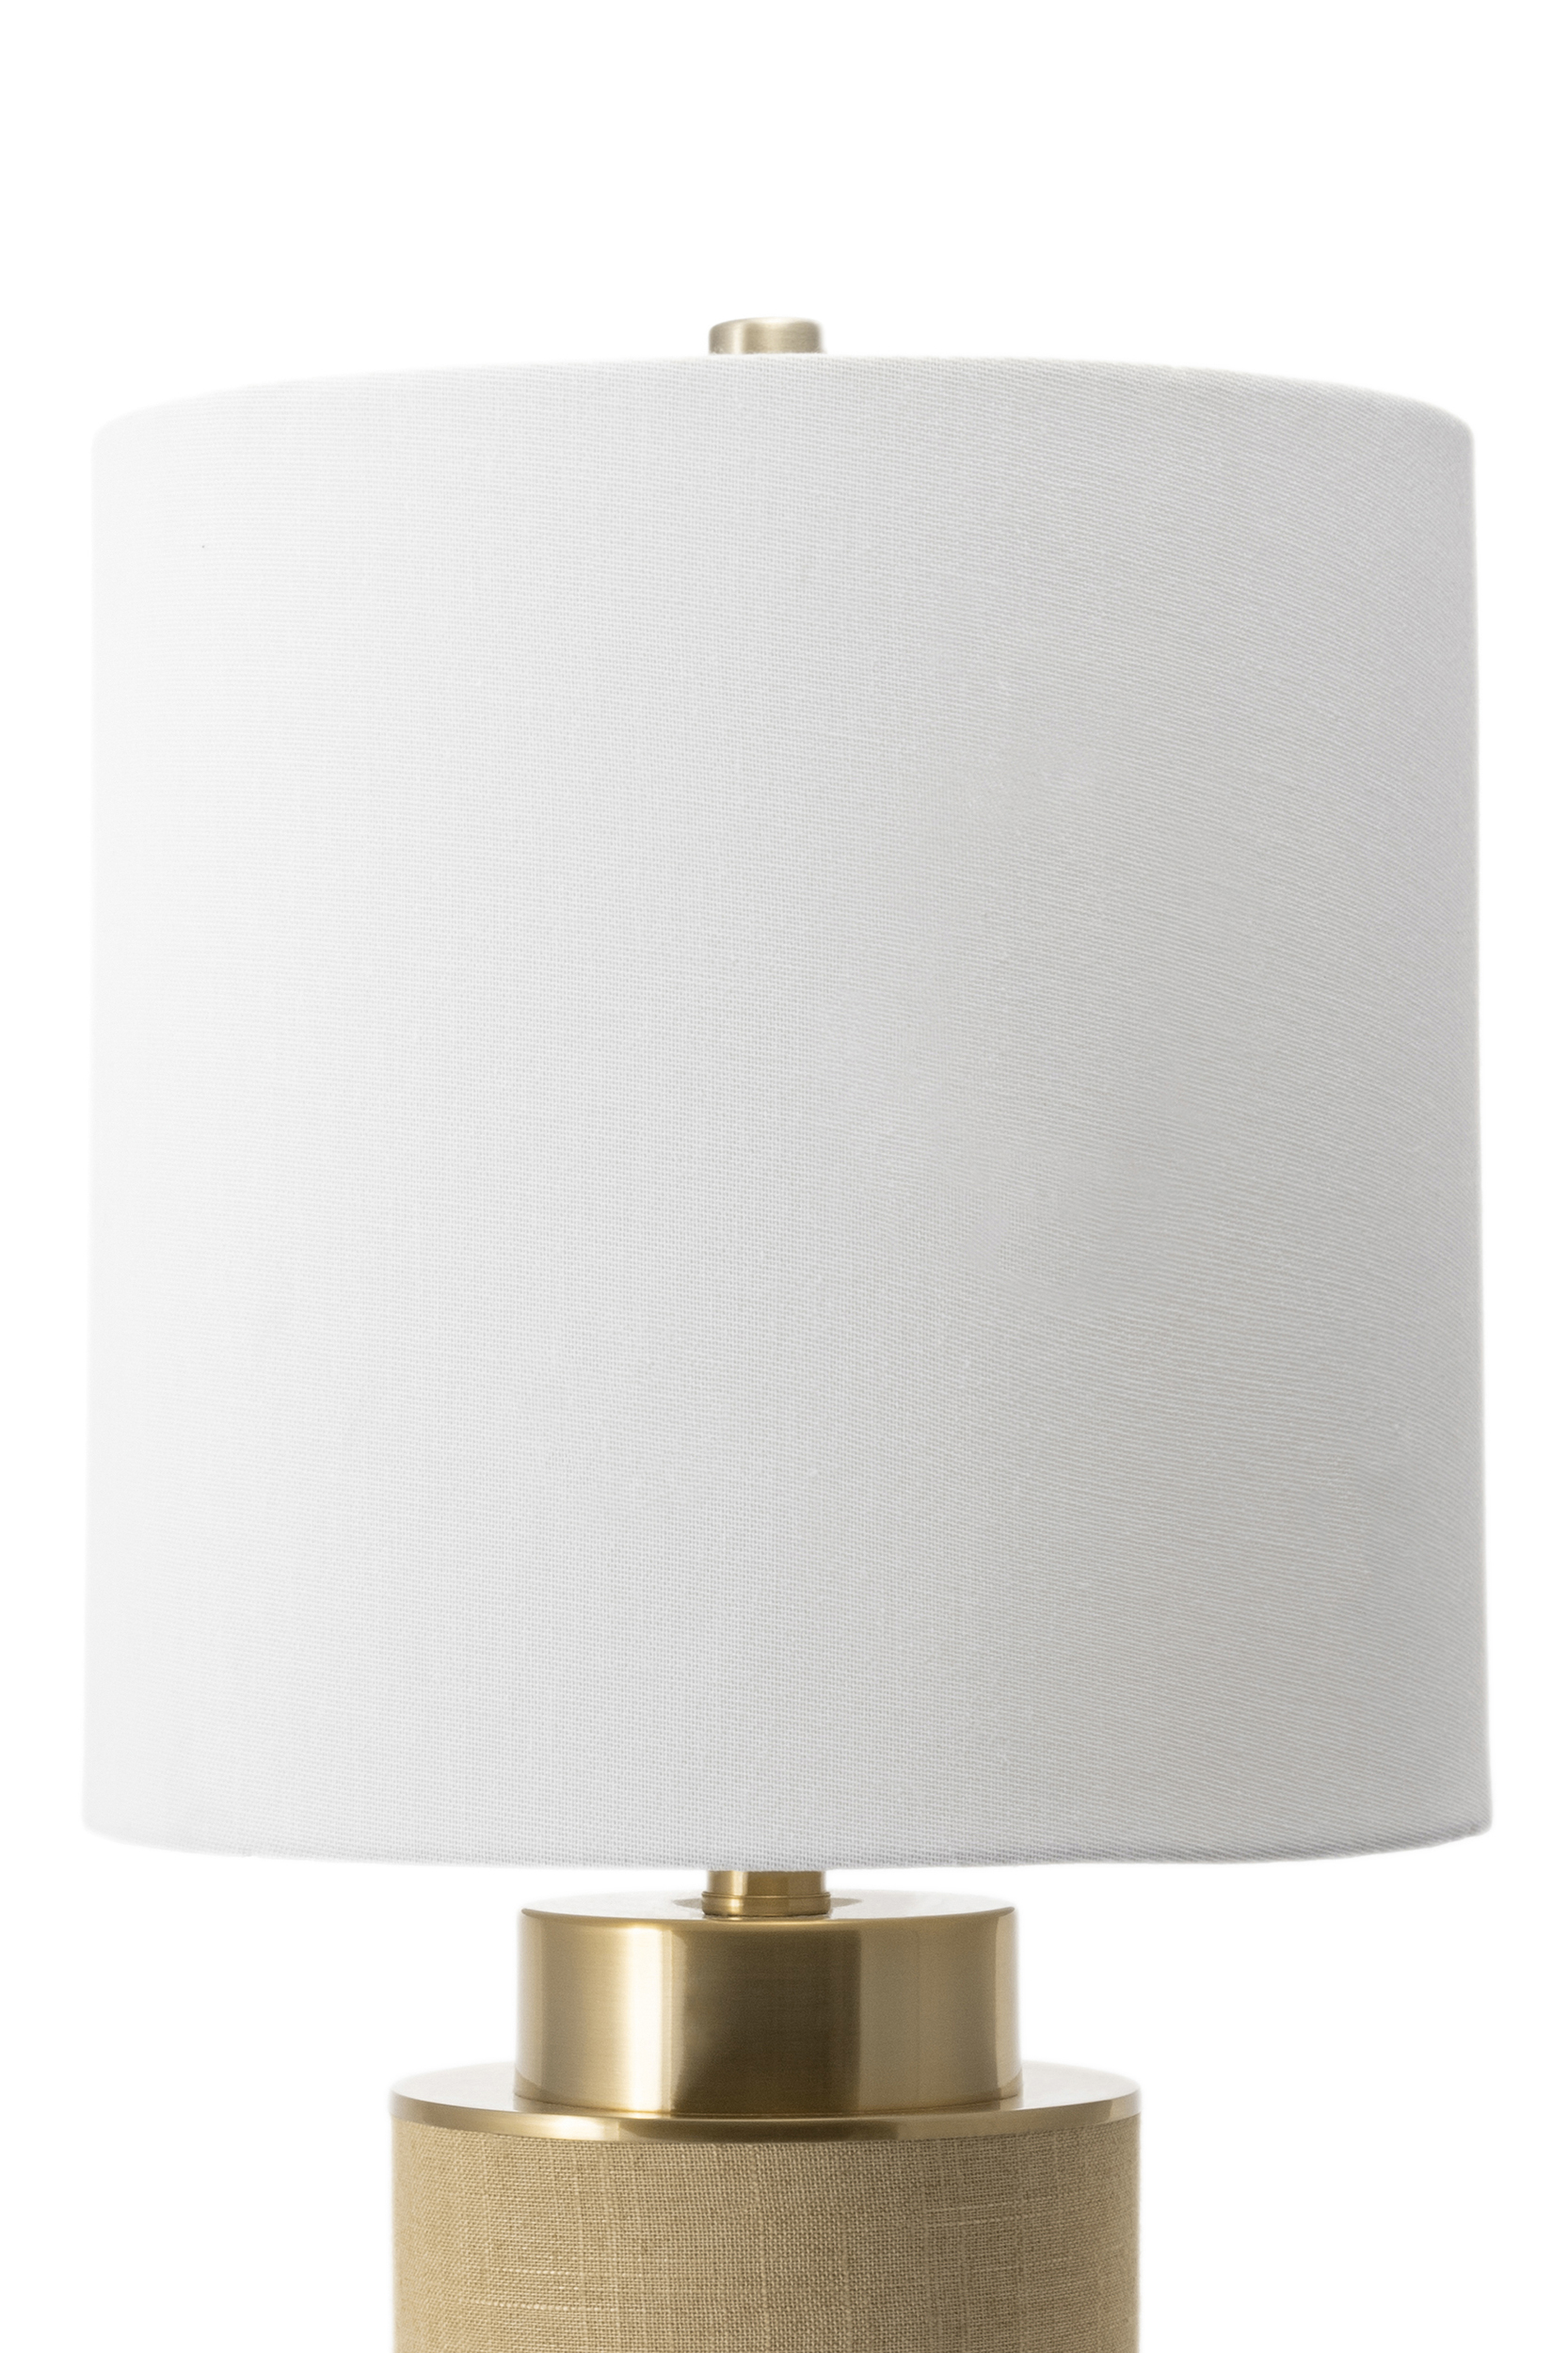 "Ramona 24"" Iron Table Lamp"